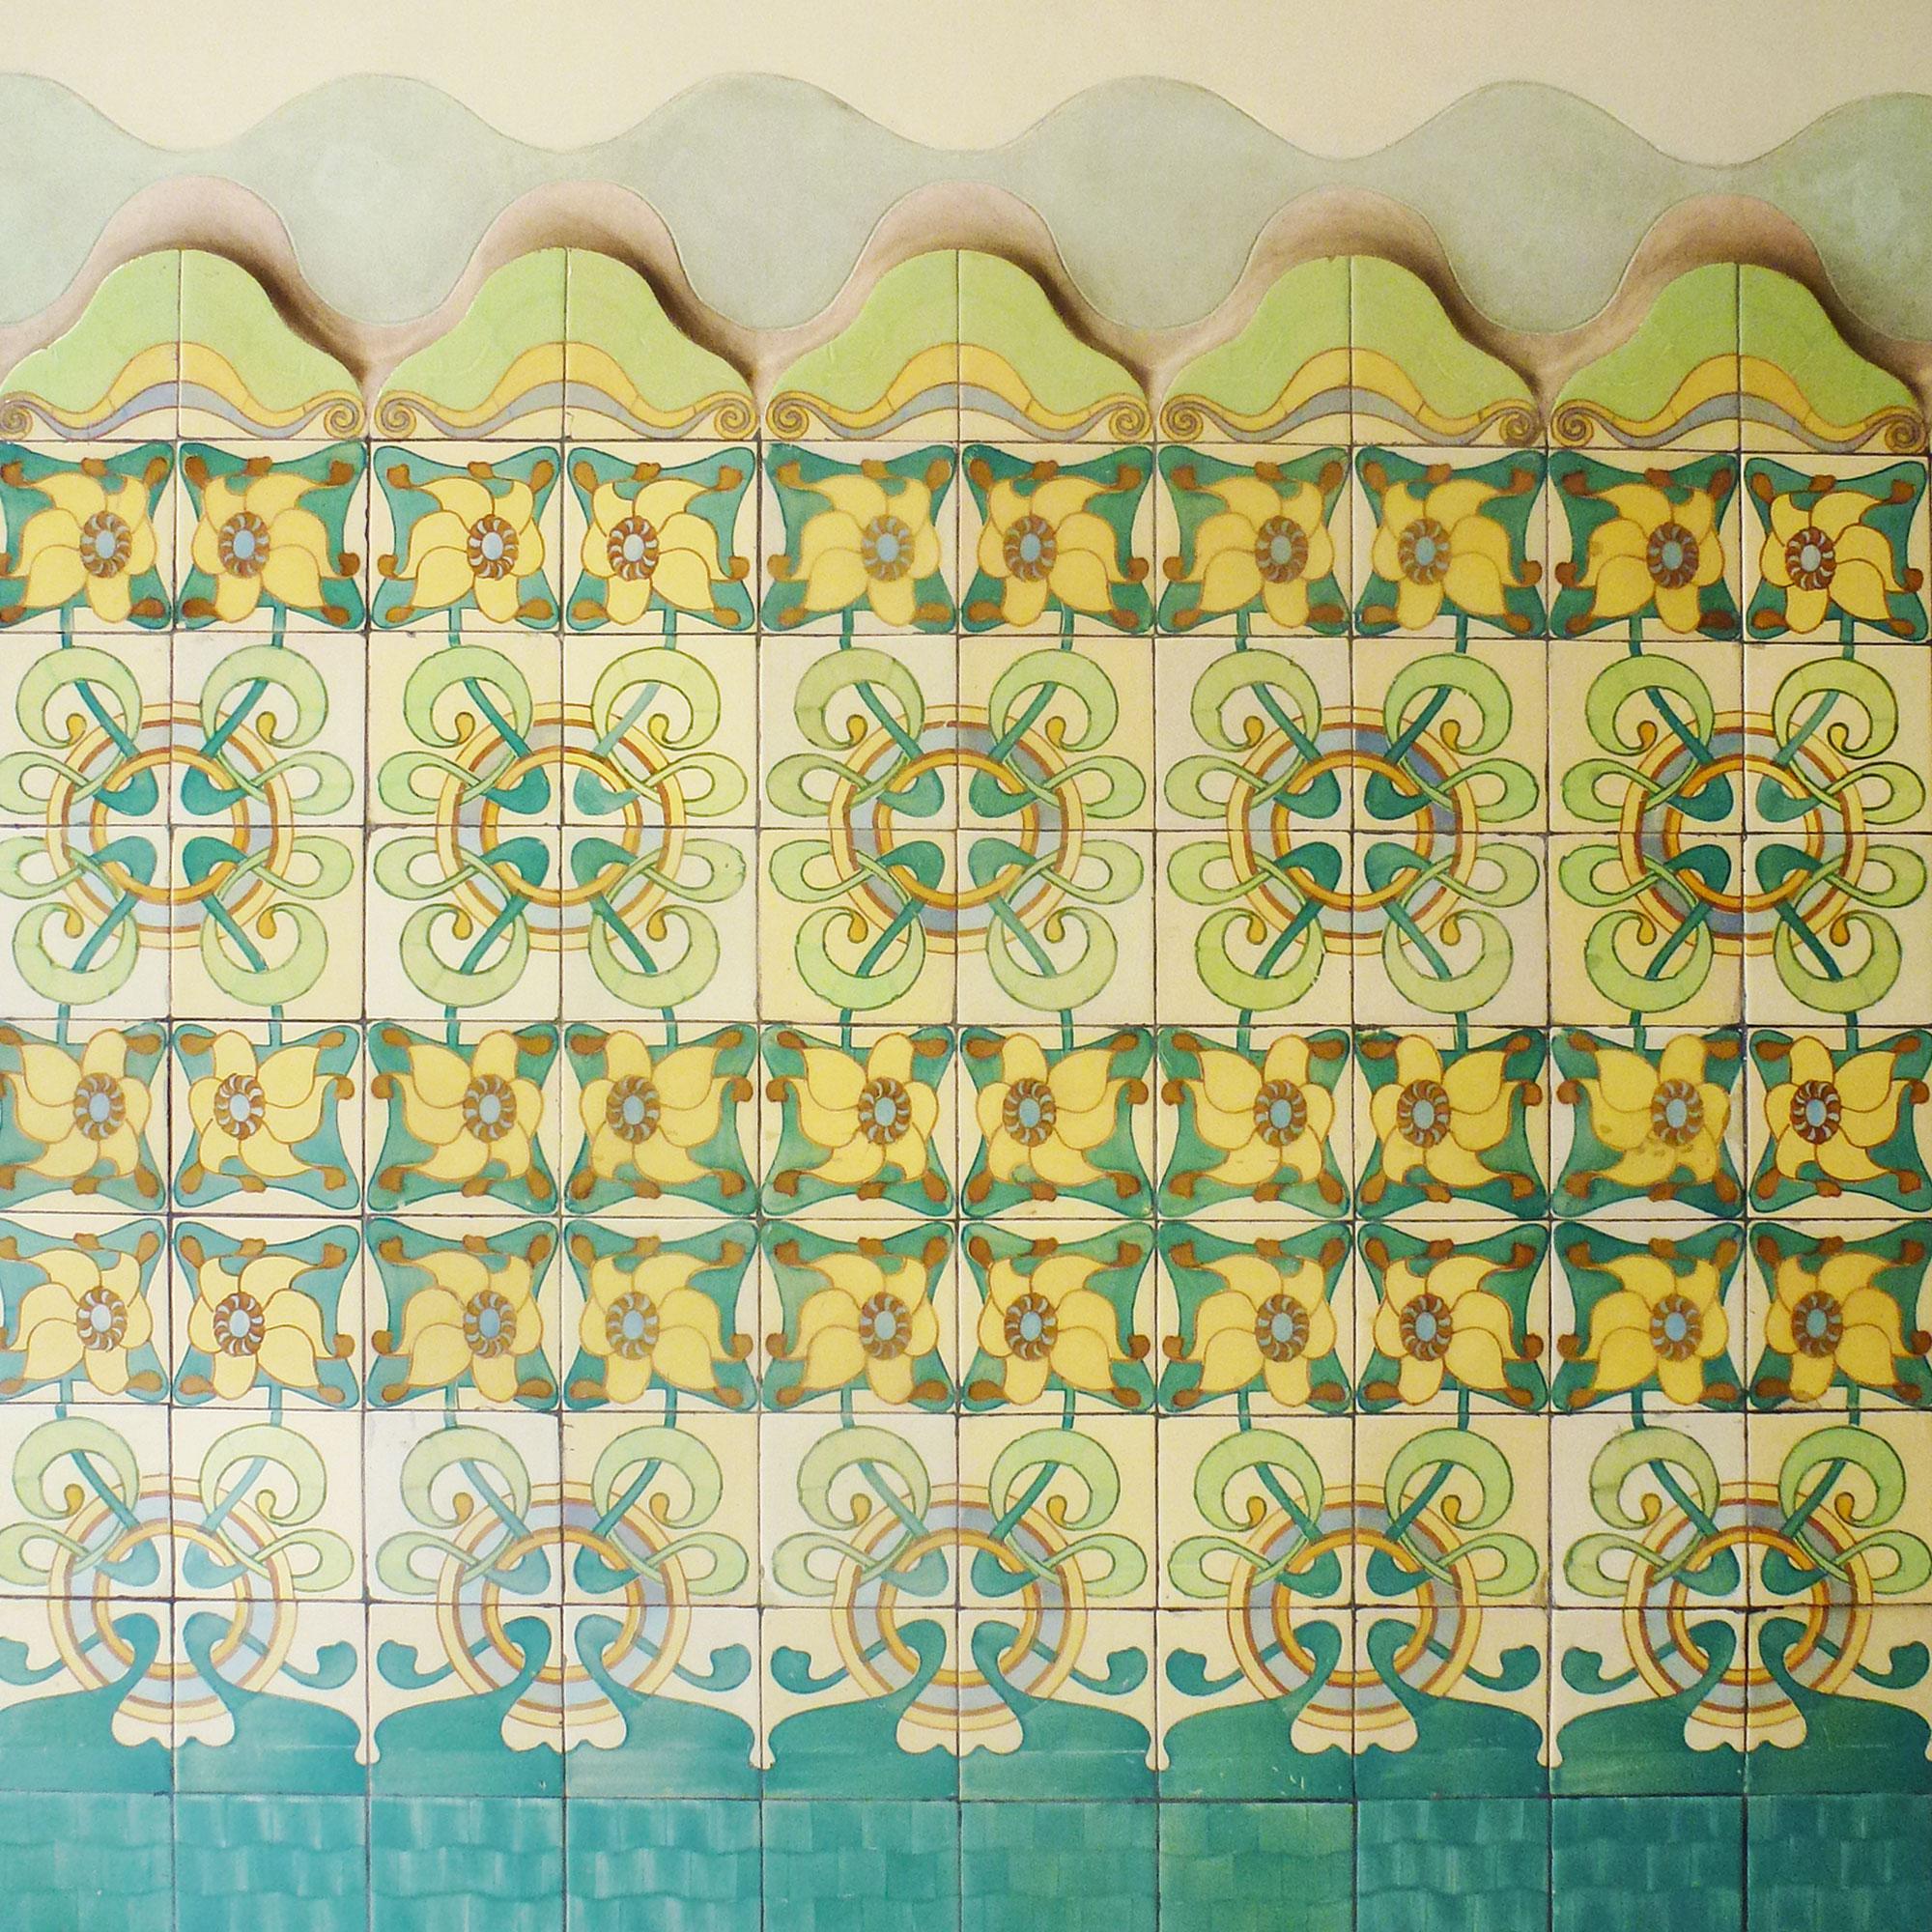 Casa Francesc Cama Art Nouveau ceramic tiles green yellow flowers